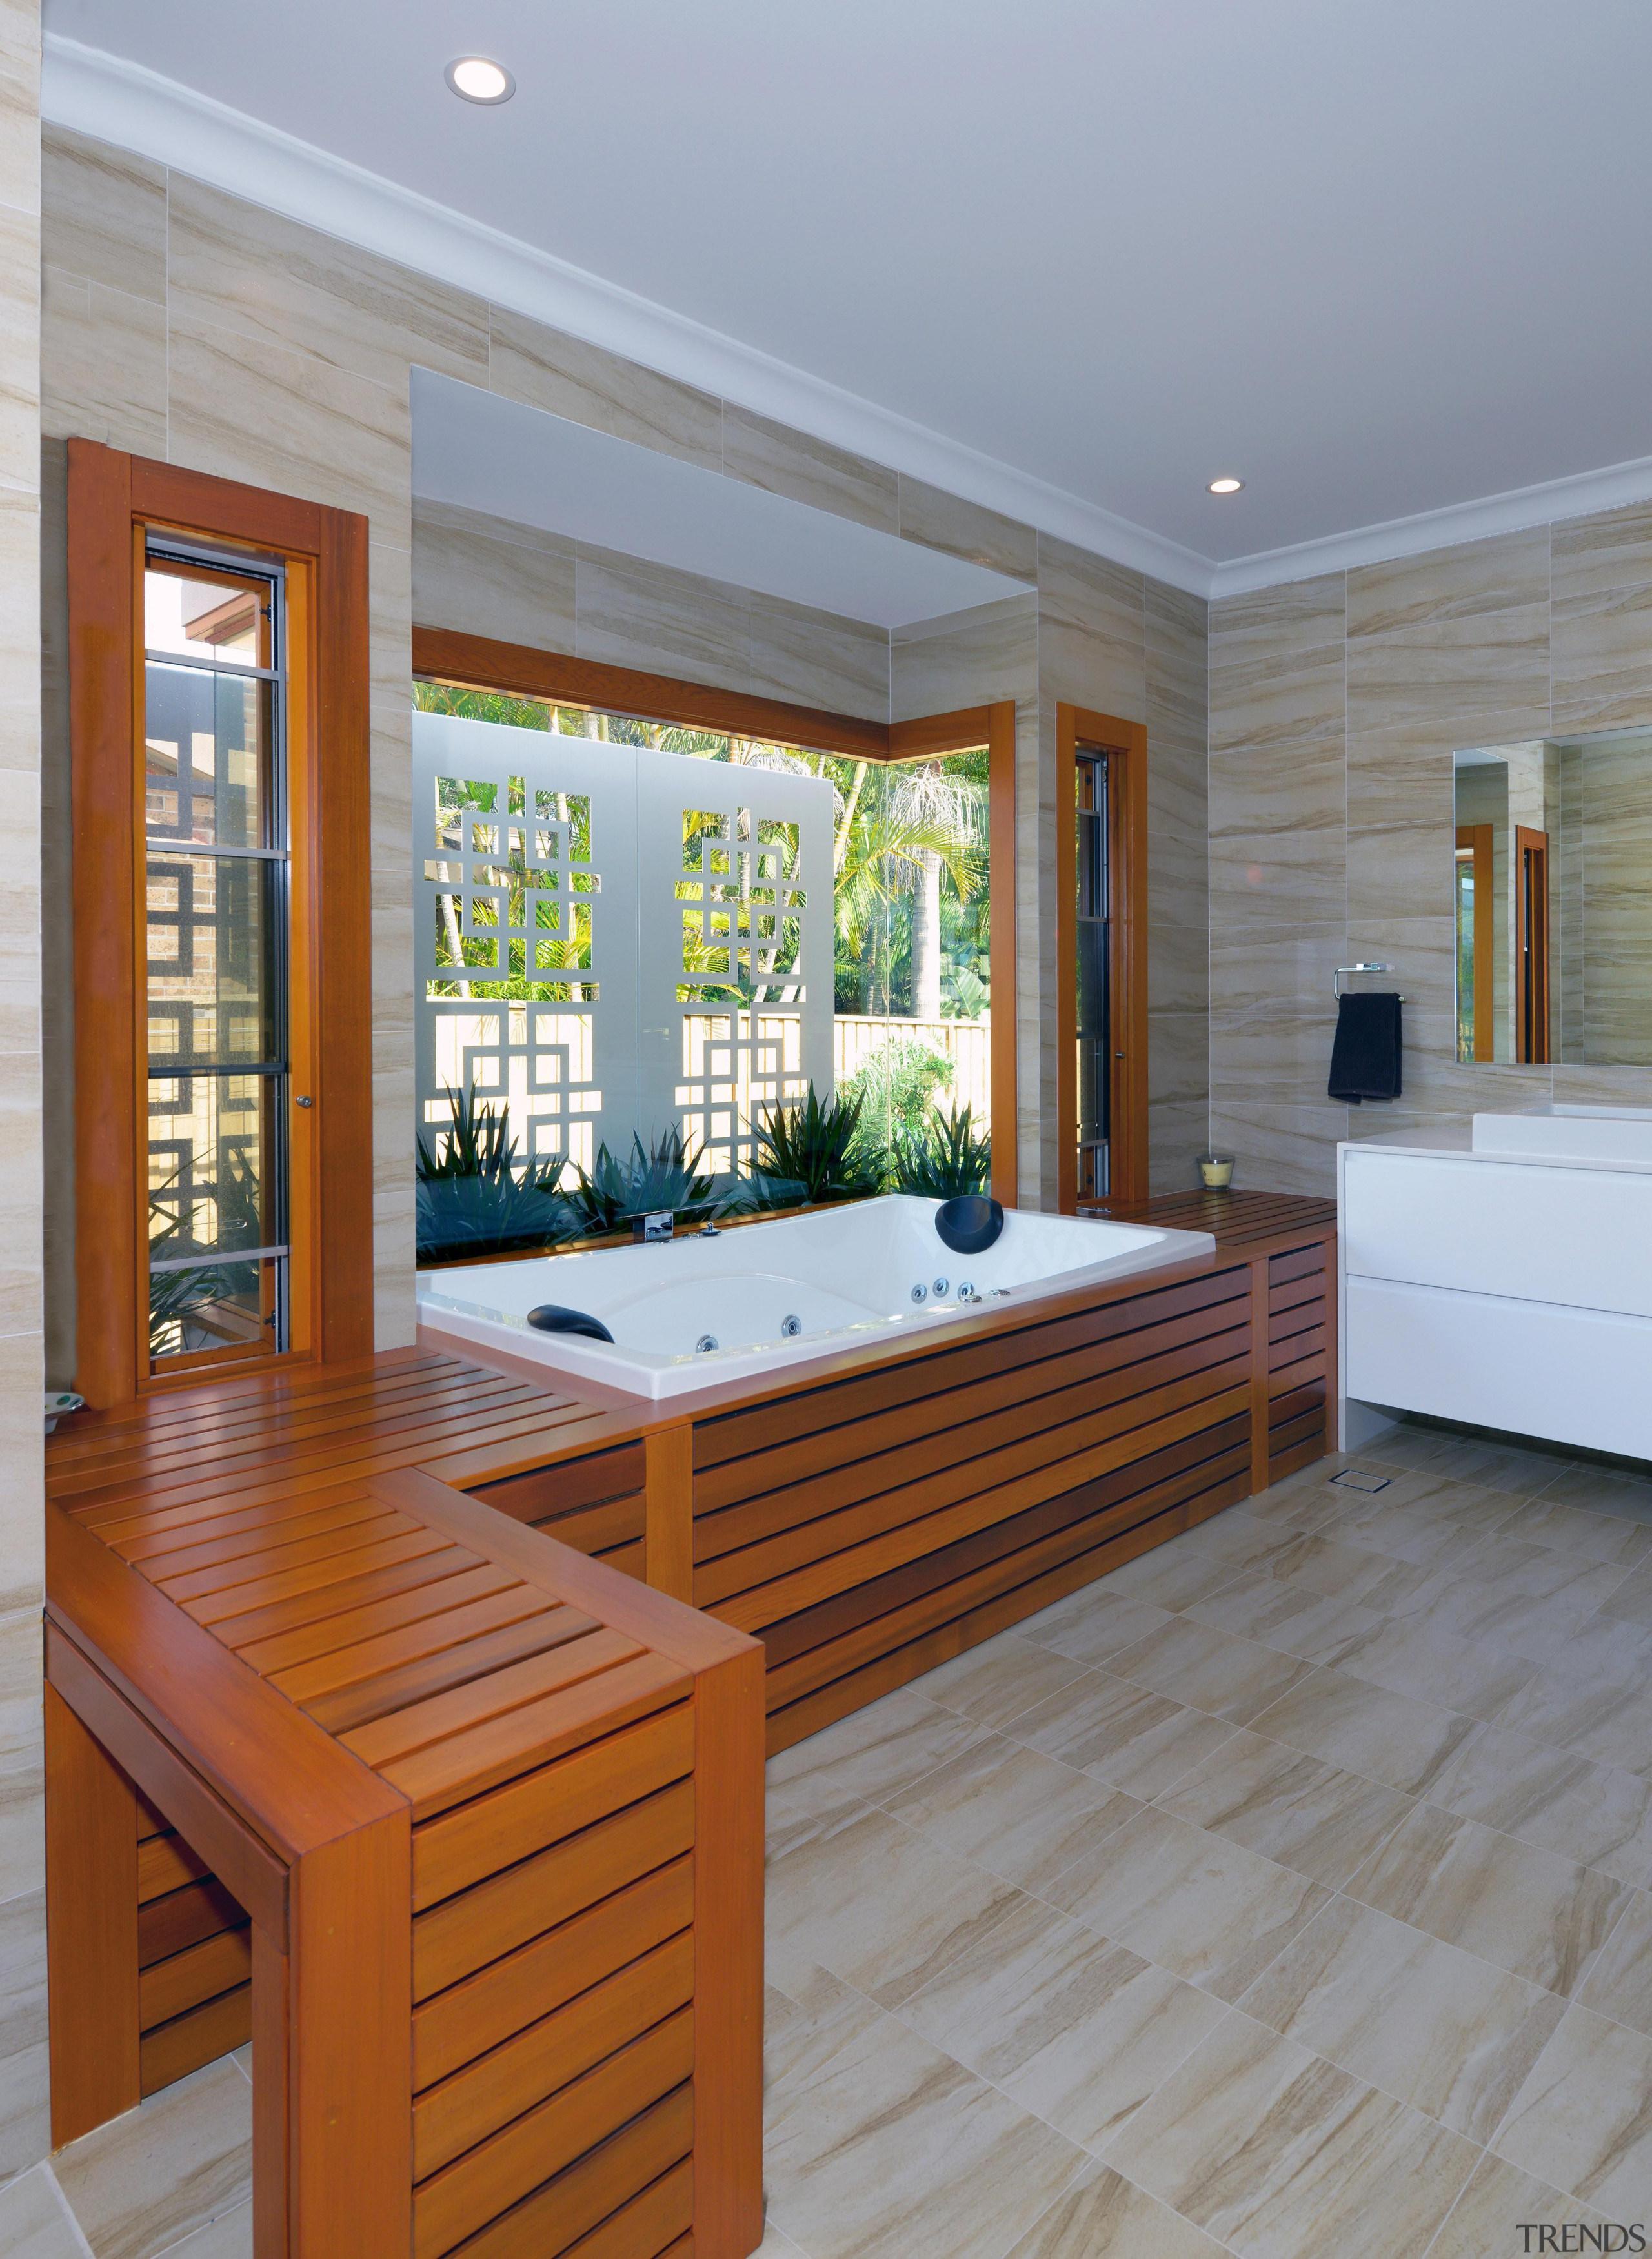 Winner Bathroom Design fo the Year 2013 Hunter ceiling, floor, flooring, hardwood, interior design, real estate, window, wood, wood flooring, gray